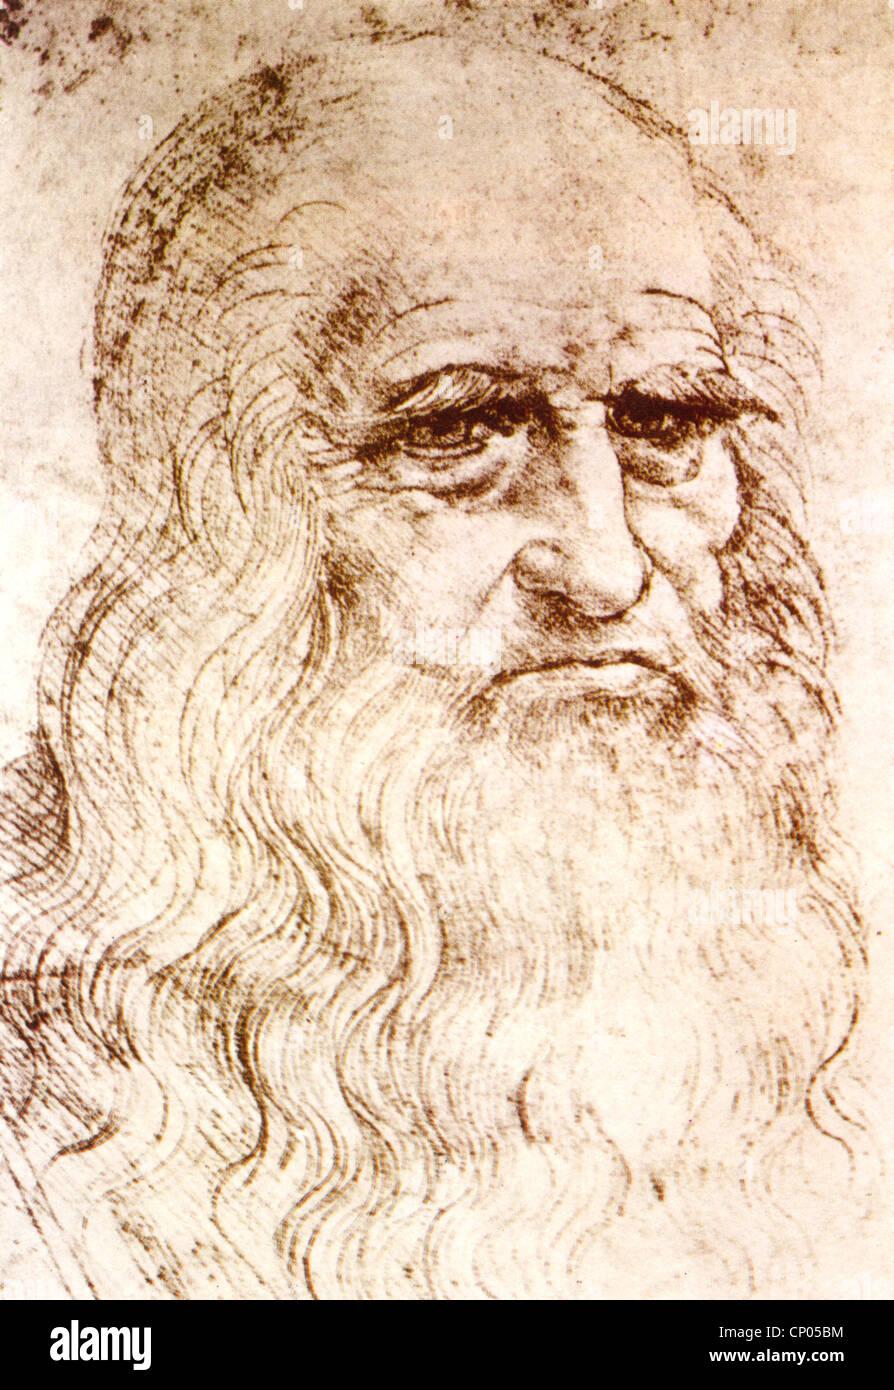 LEONARDO da VINCI (1452-1519) italienischer Renaissance Universalgelehrter - Selbstportrait in Rötel über Stockbild